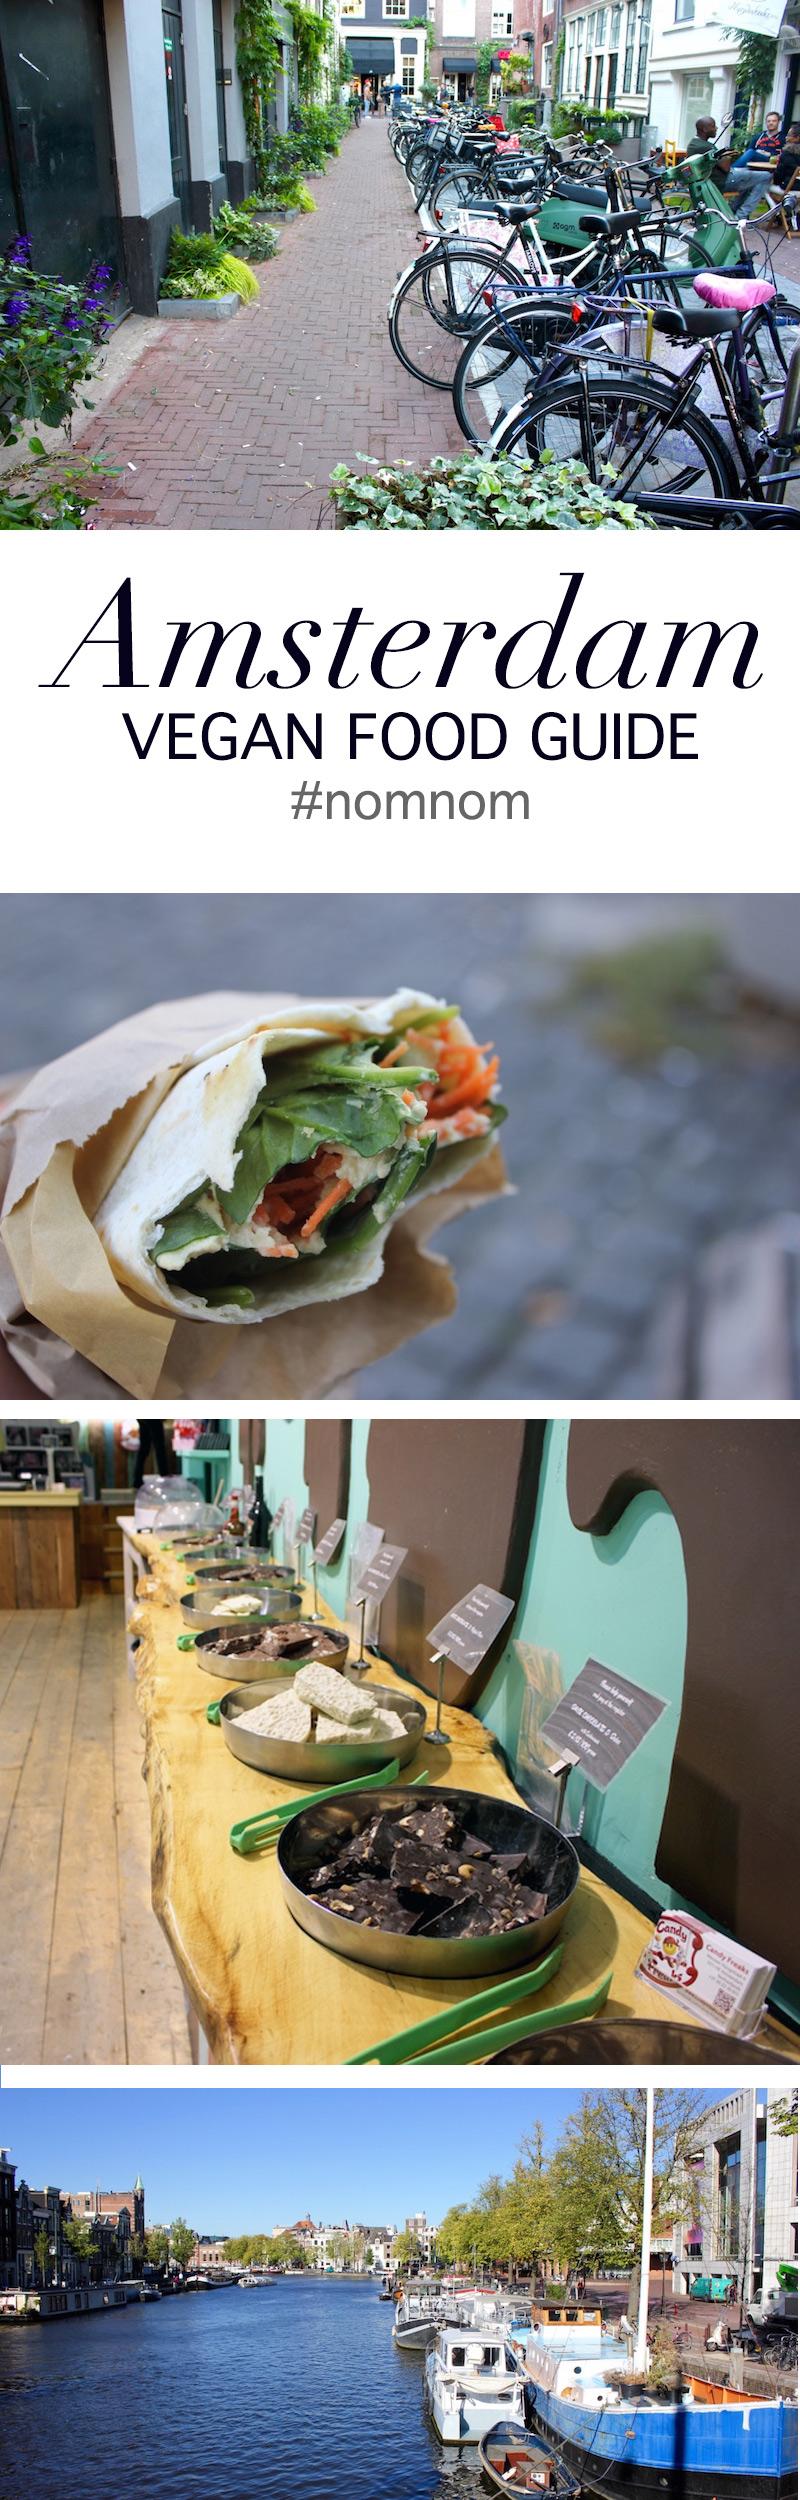 amsterdam-best-vegan-eats-food-guide-futurekingandqueen.jpg